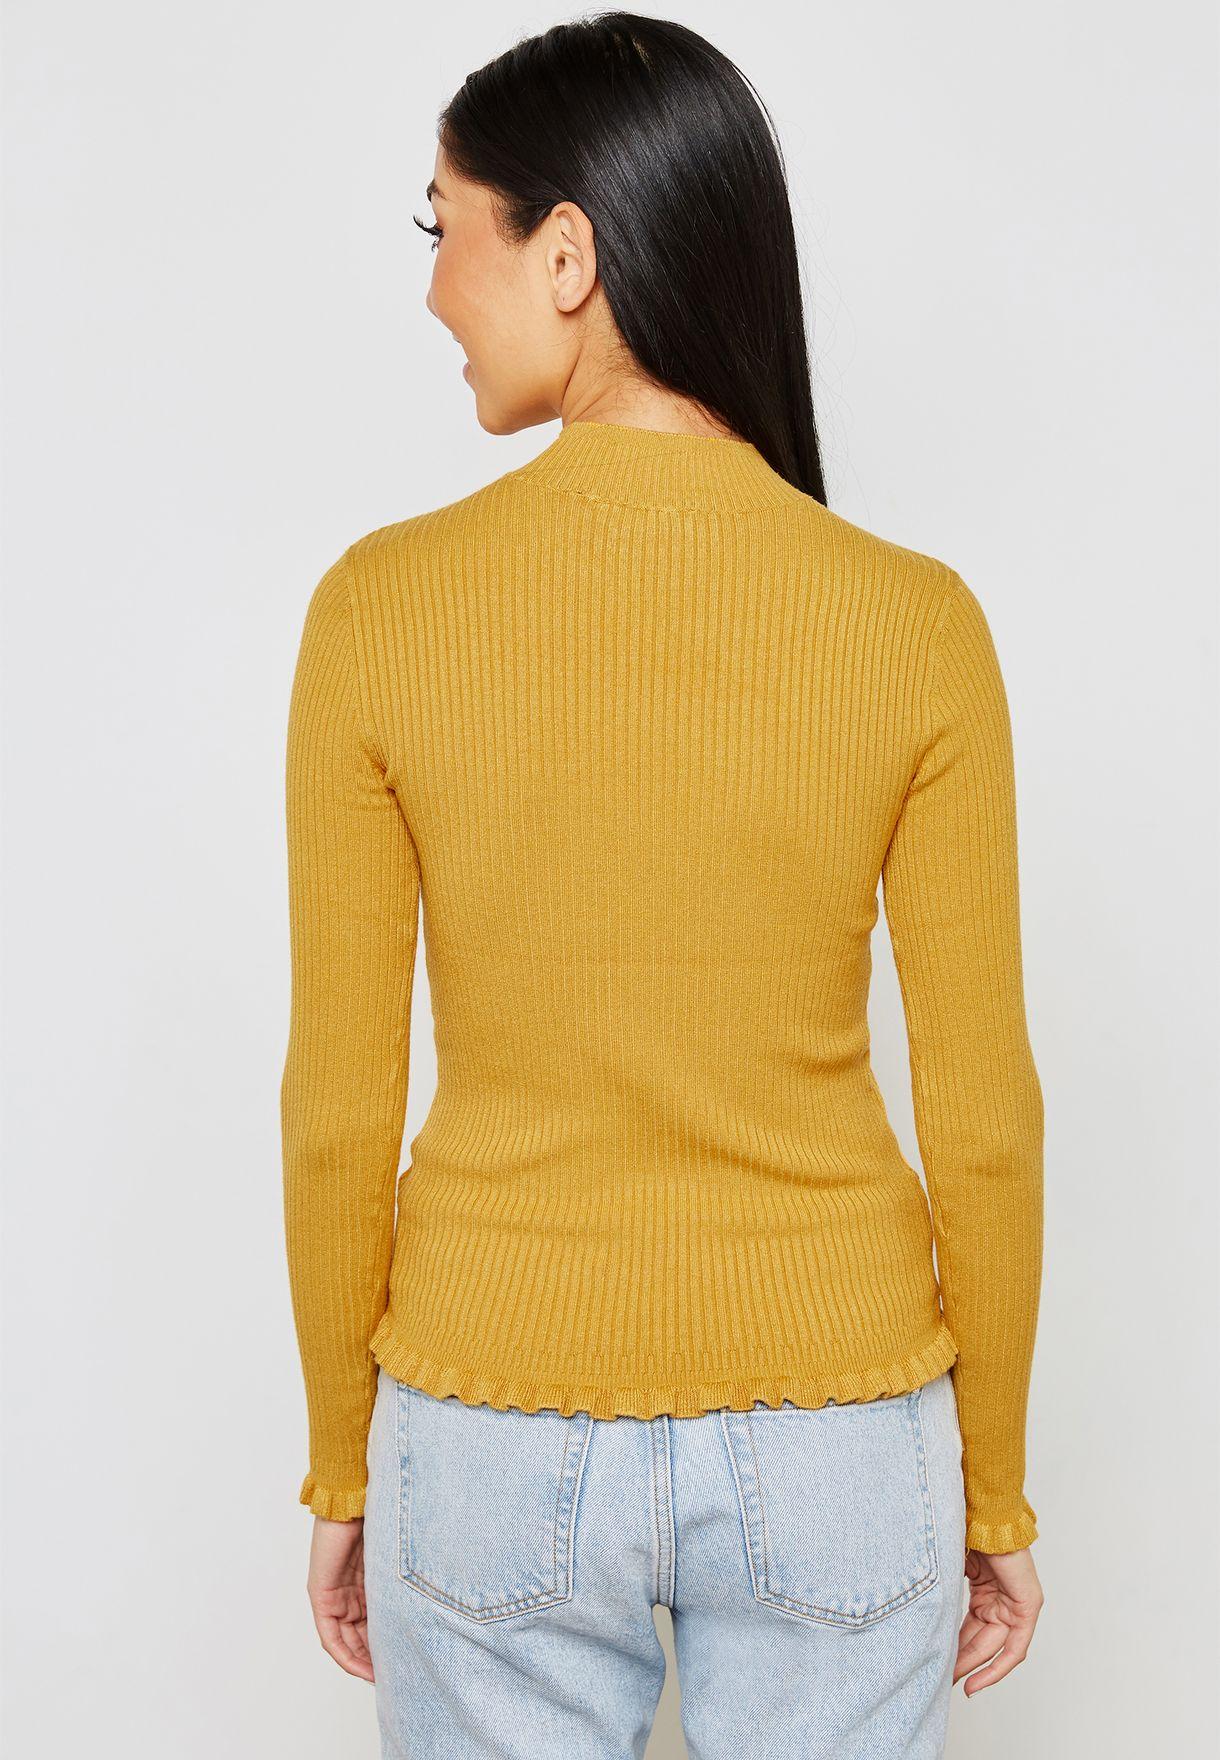 Frill Hem Rib Knitted Top